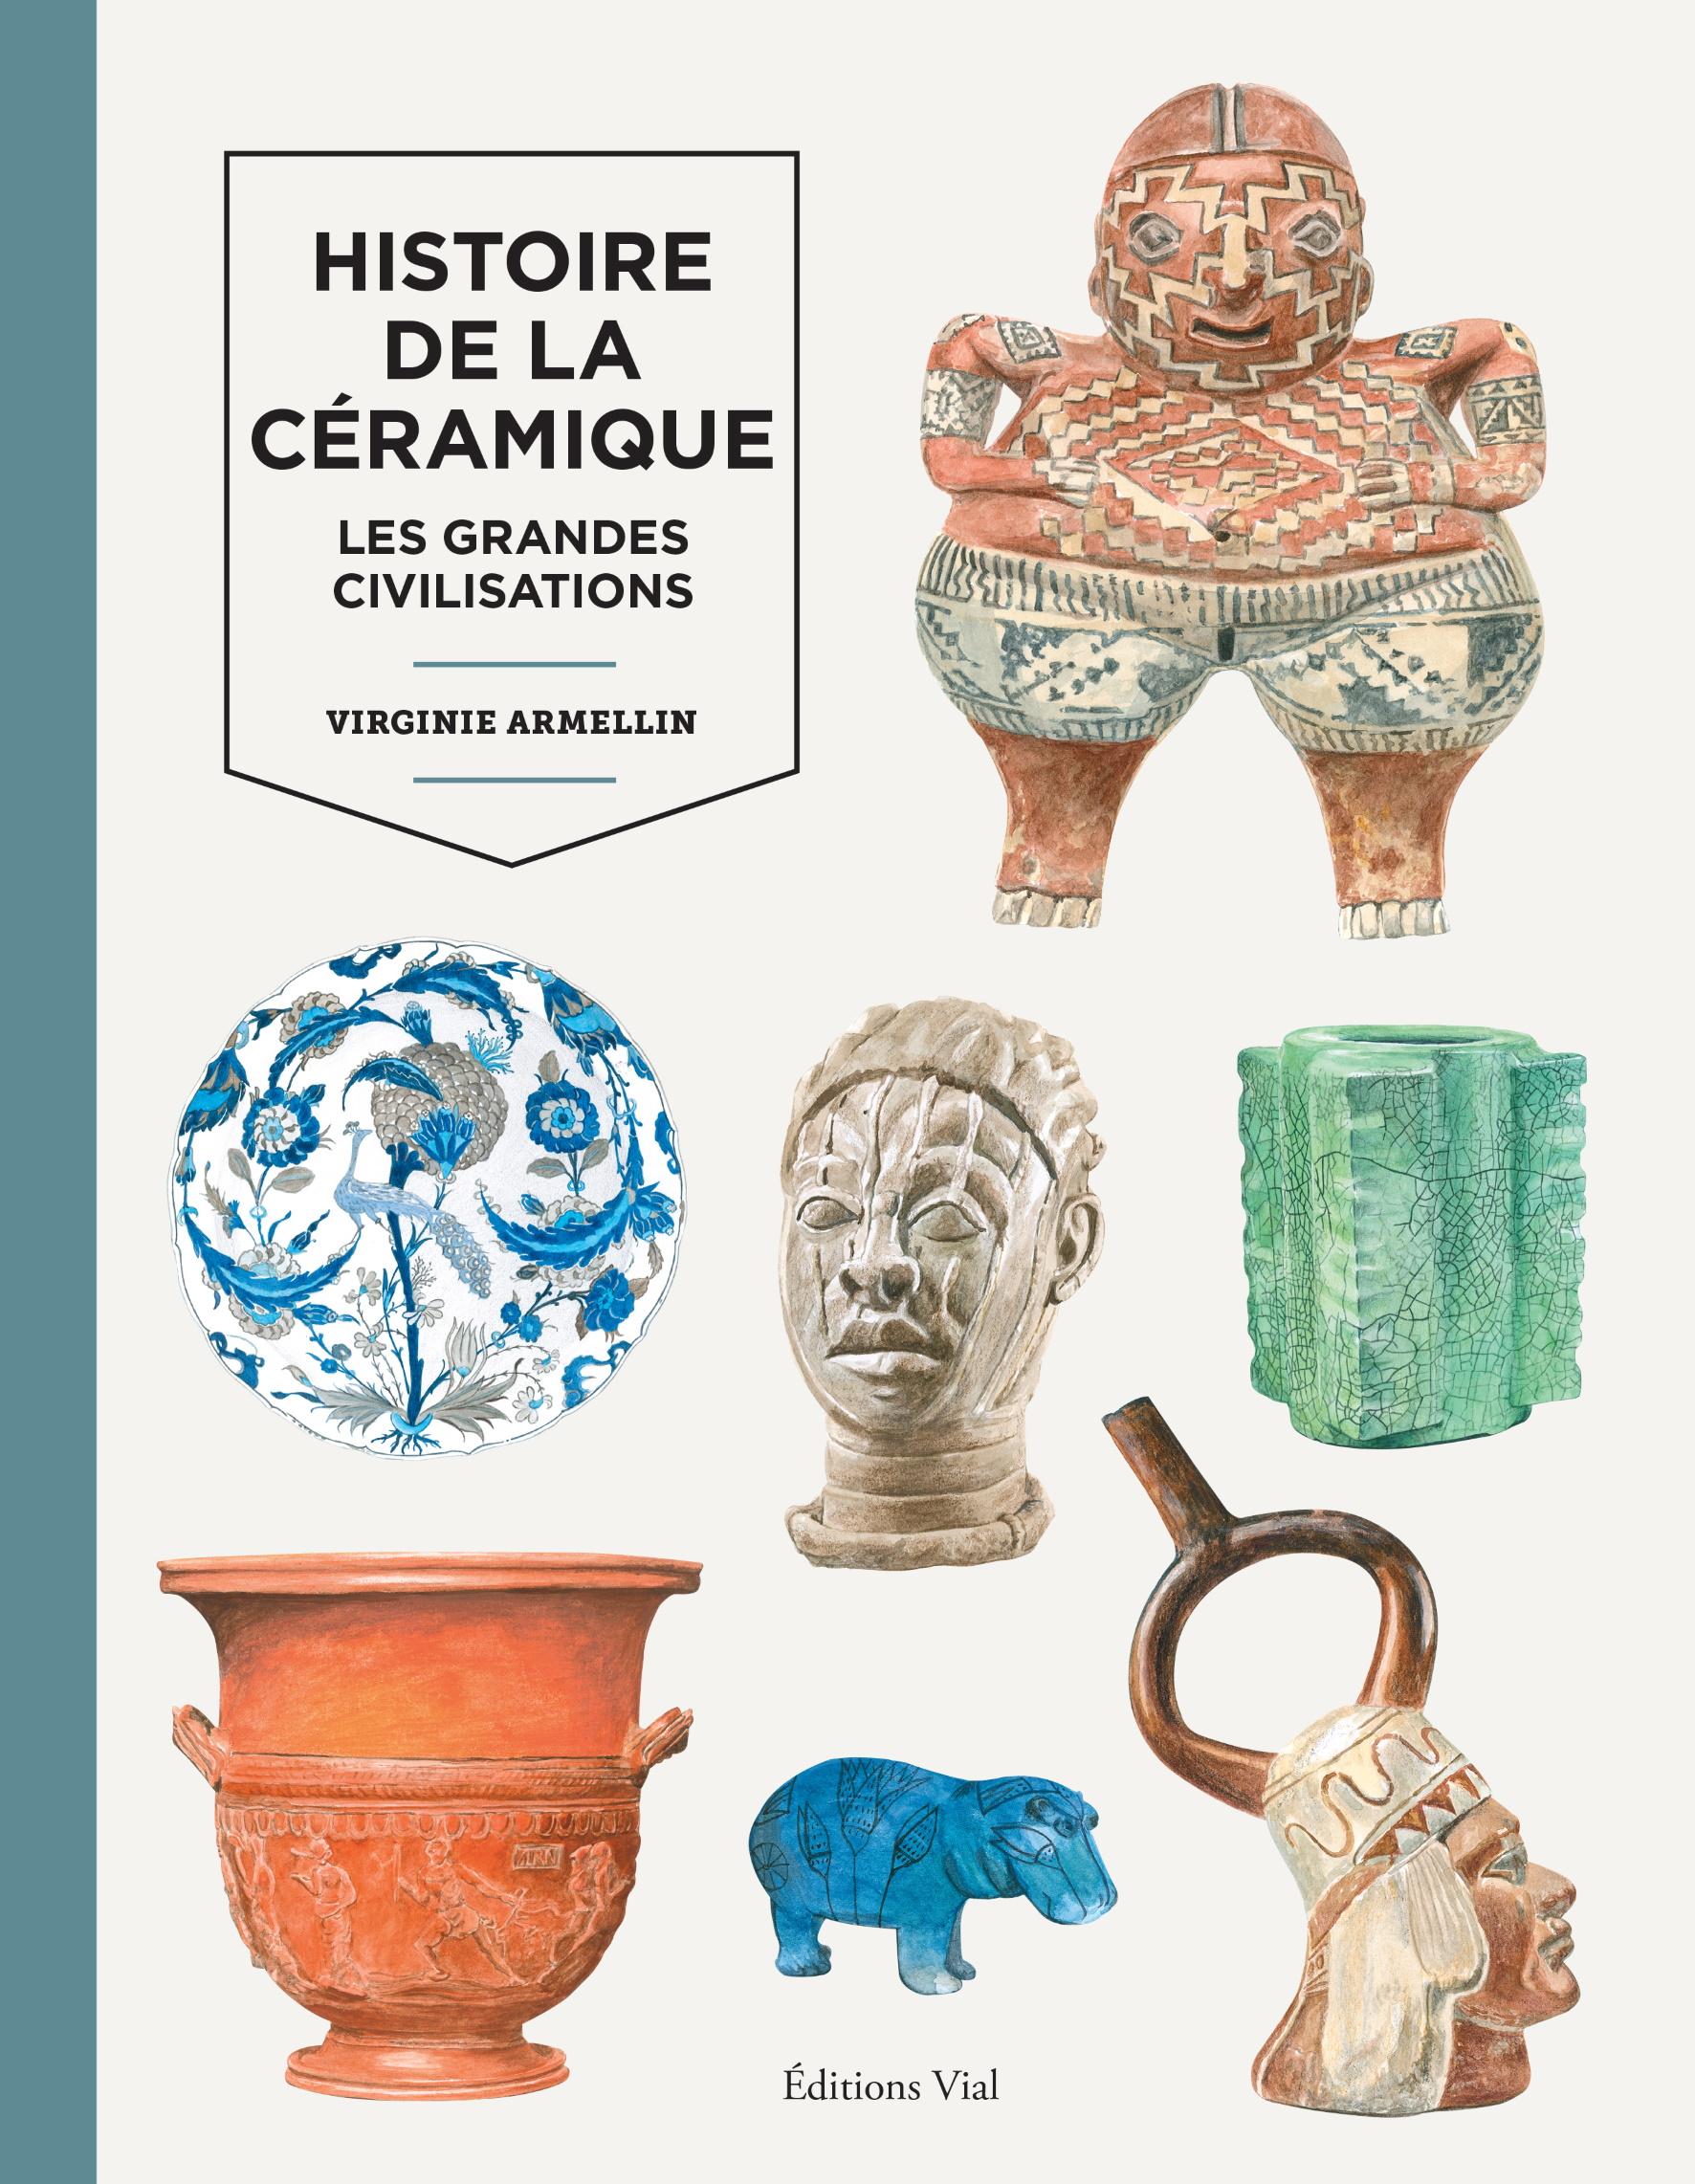 Histoire de la céramique vol. 1.